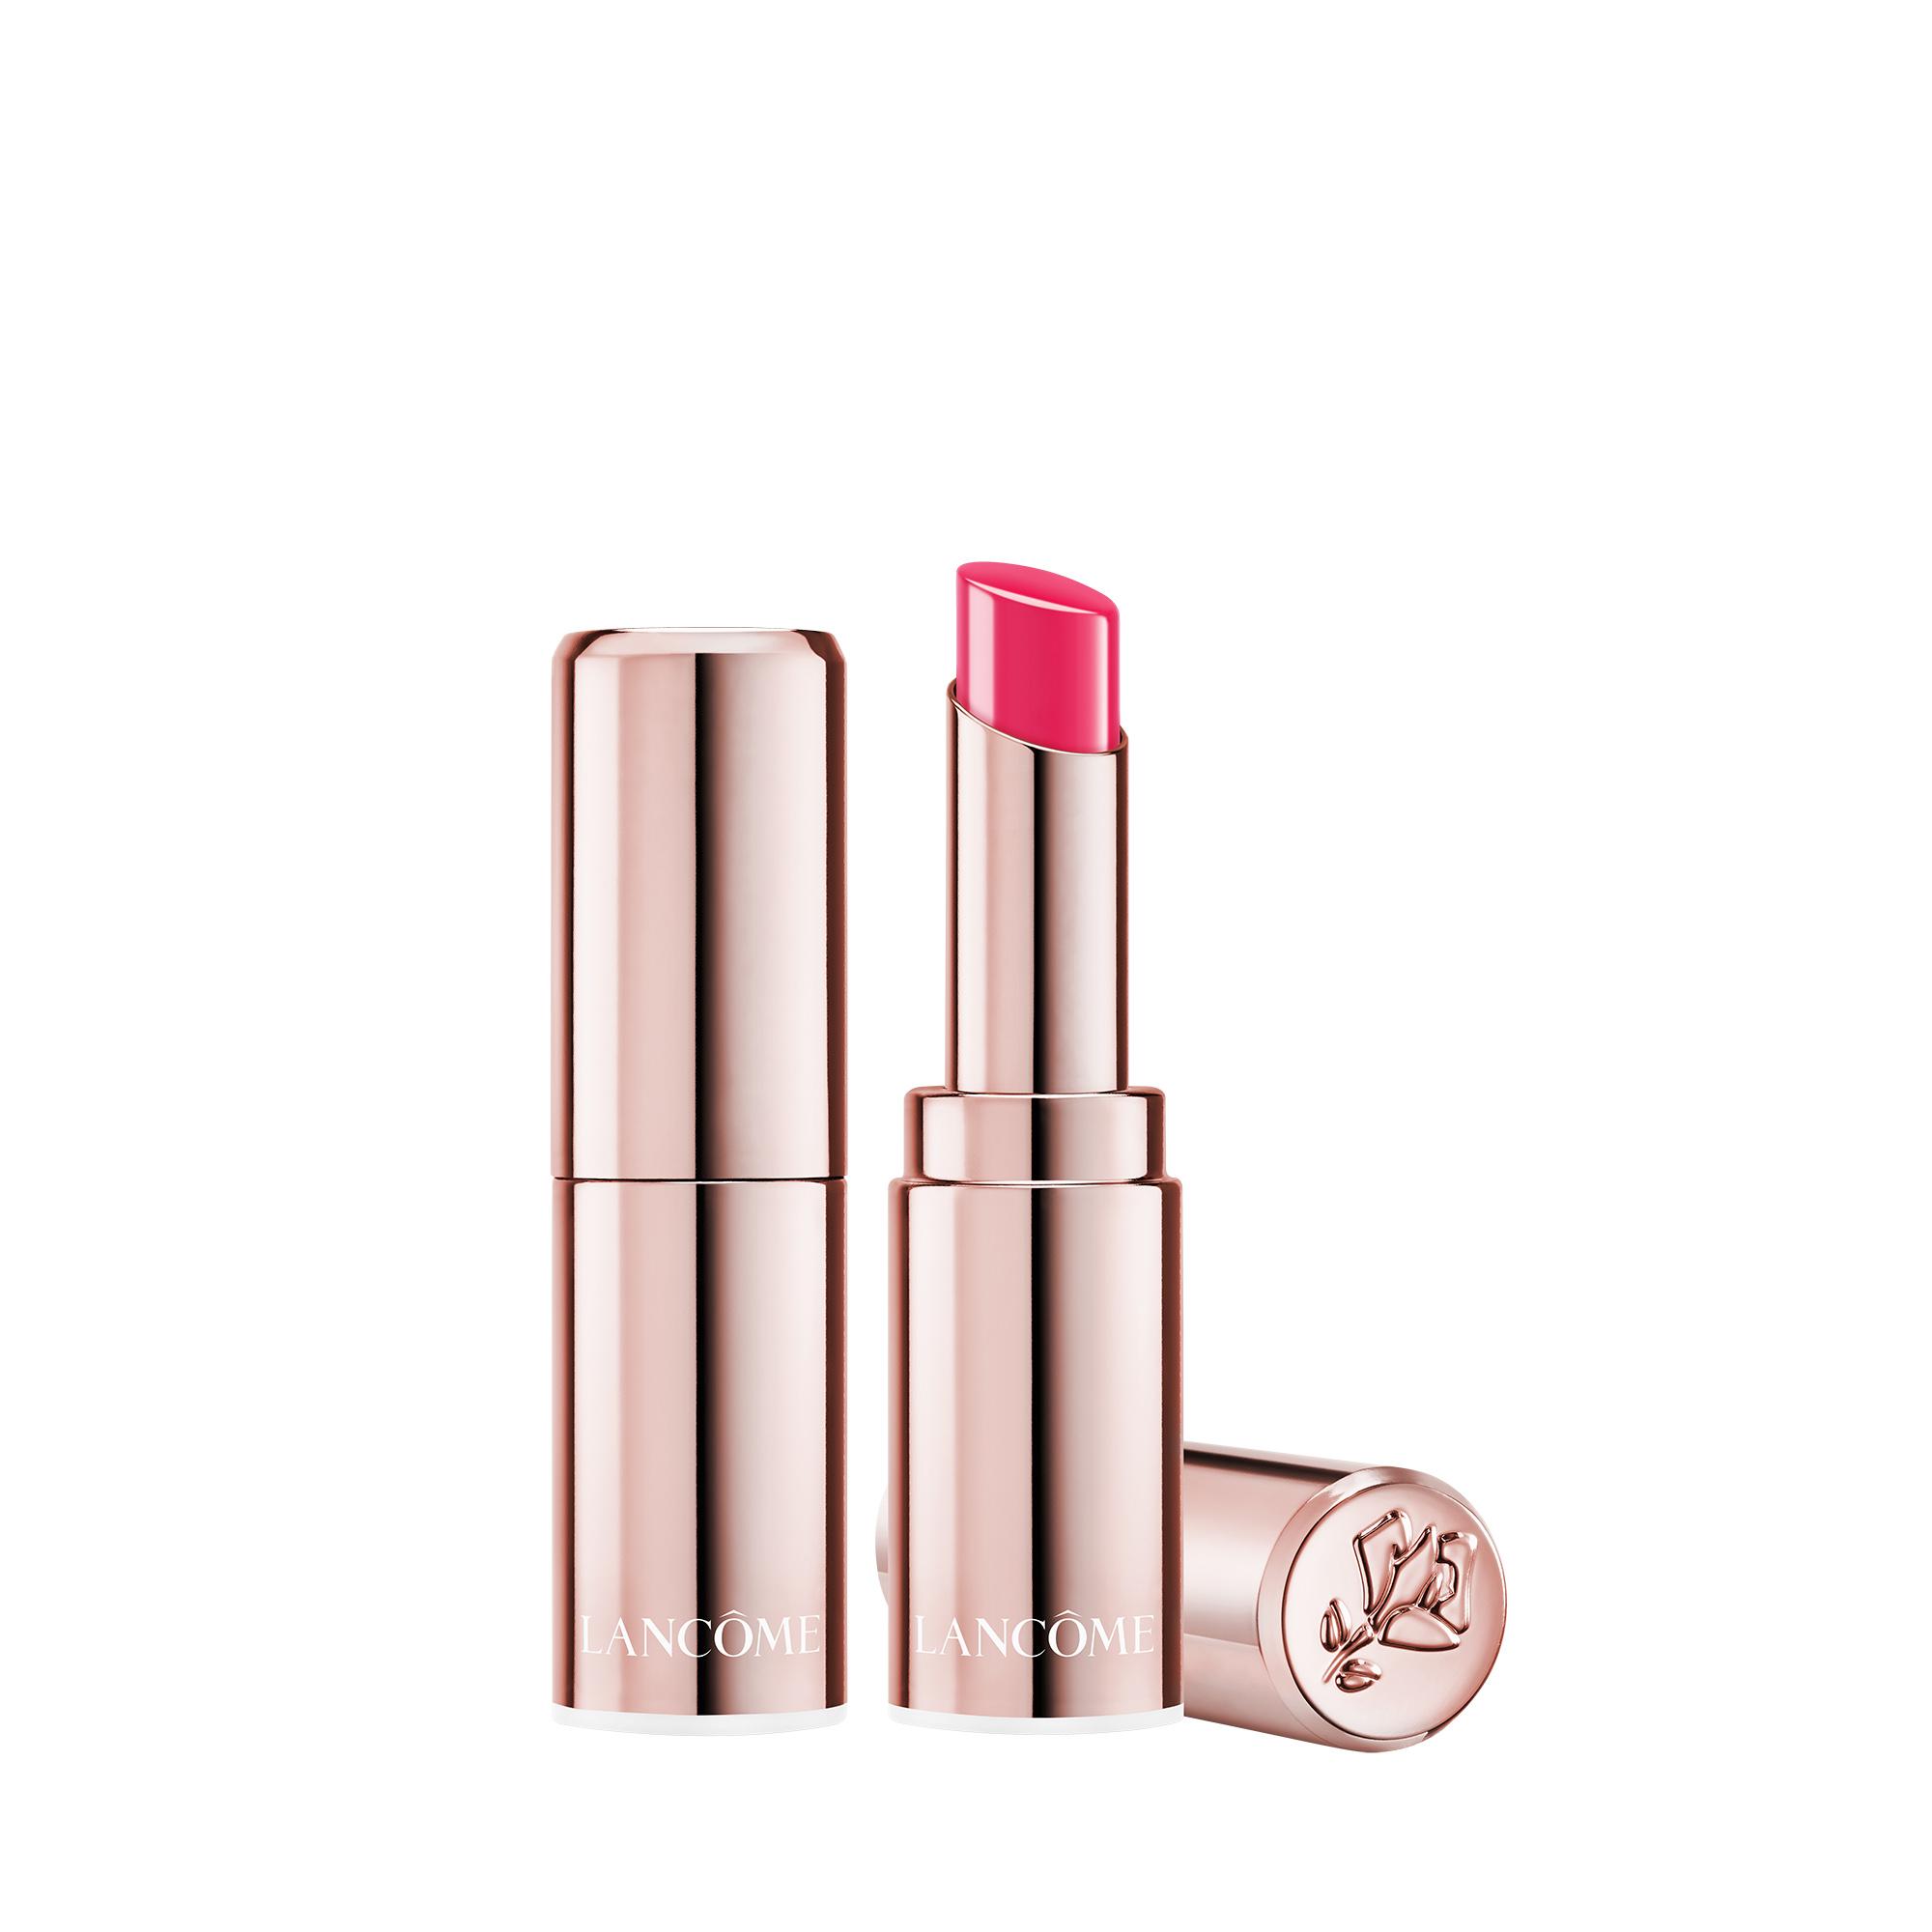 An image of Lancôme L'Absolu Mademoiselle Shine Lipstick - 317 KISS ME SHINE